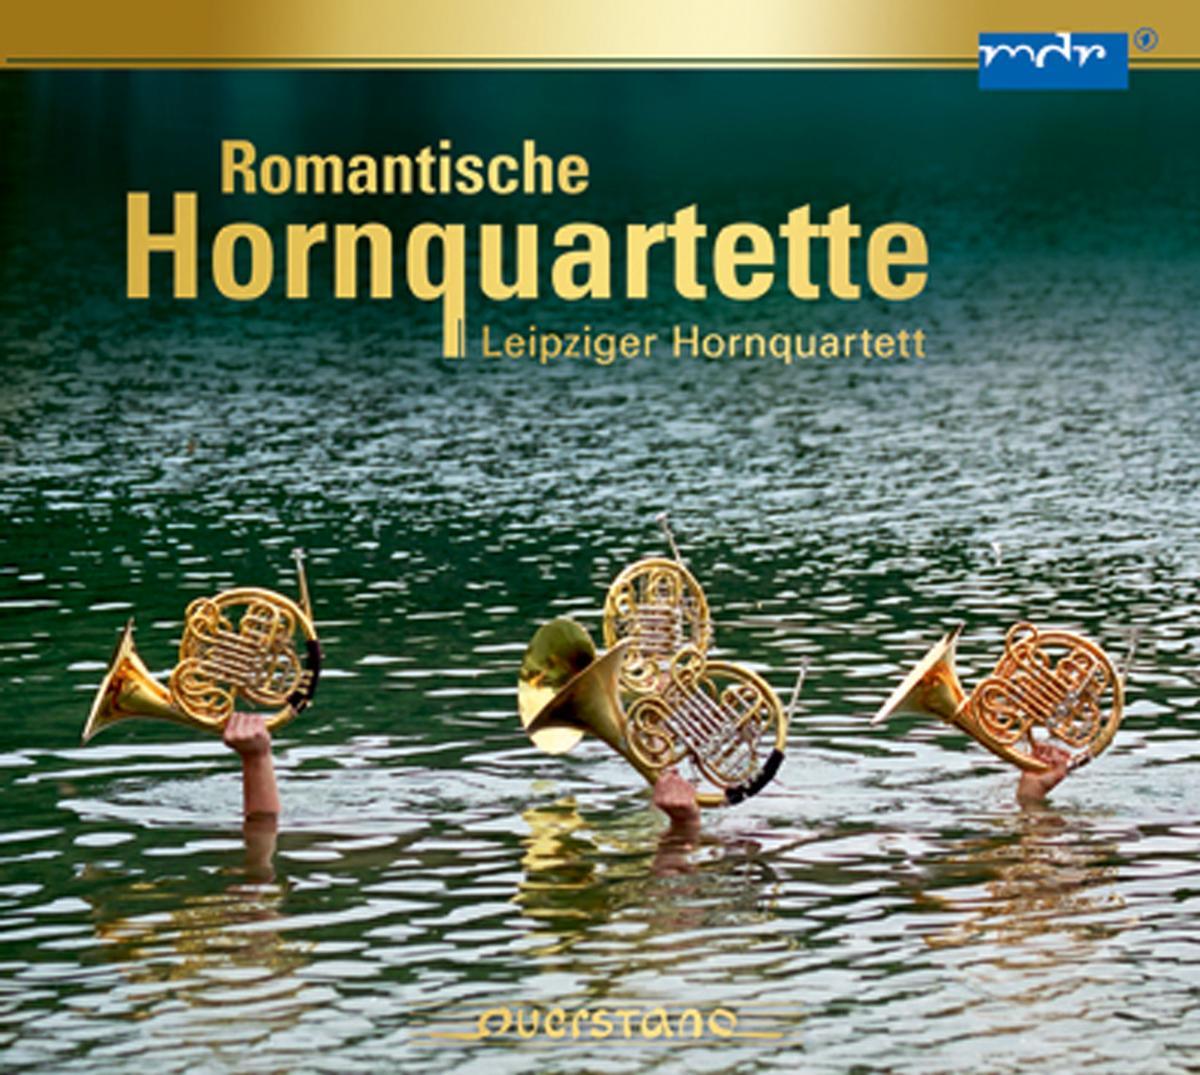 Romantische Hornquartette